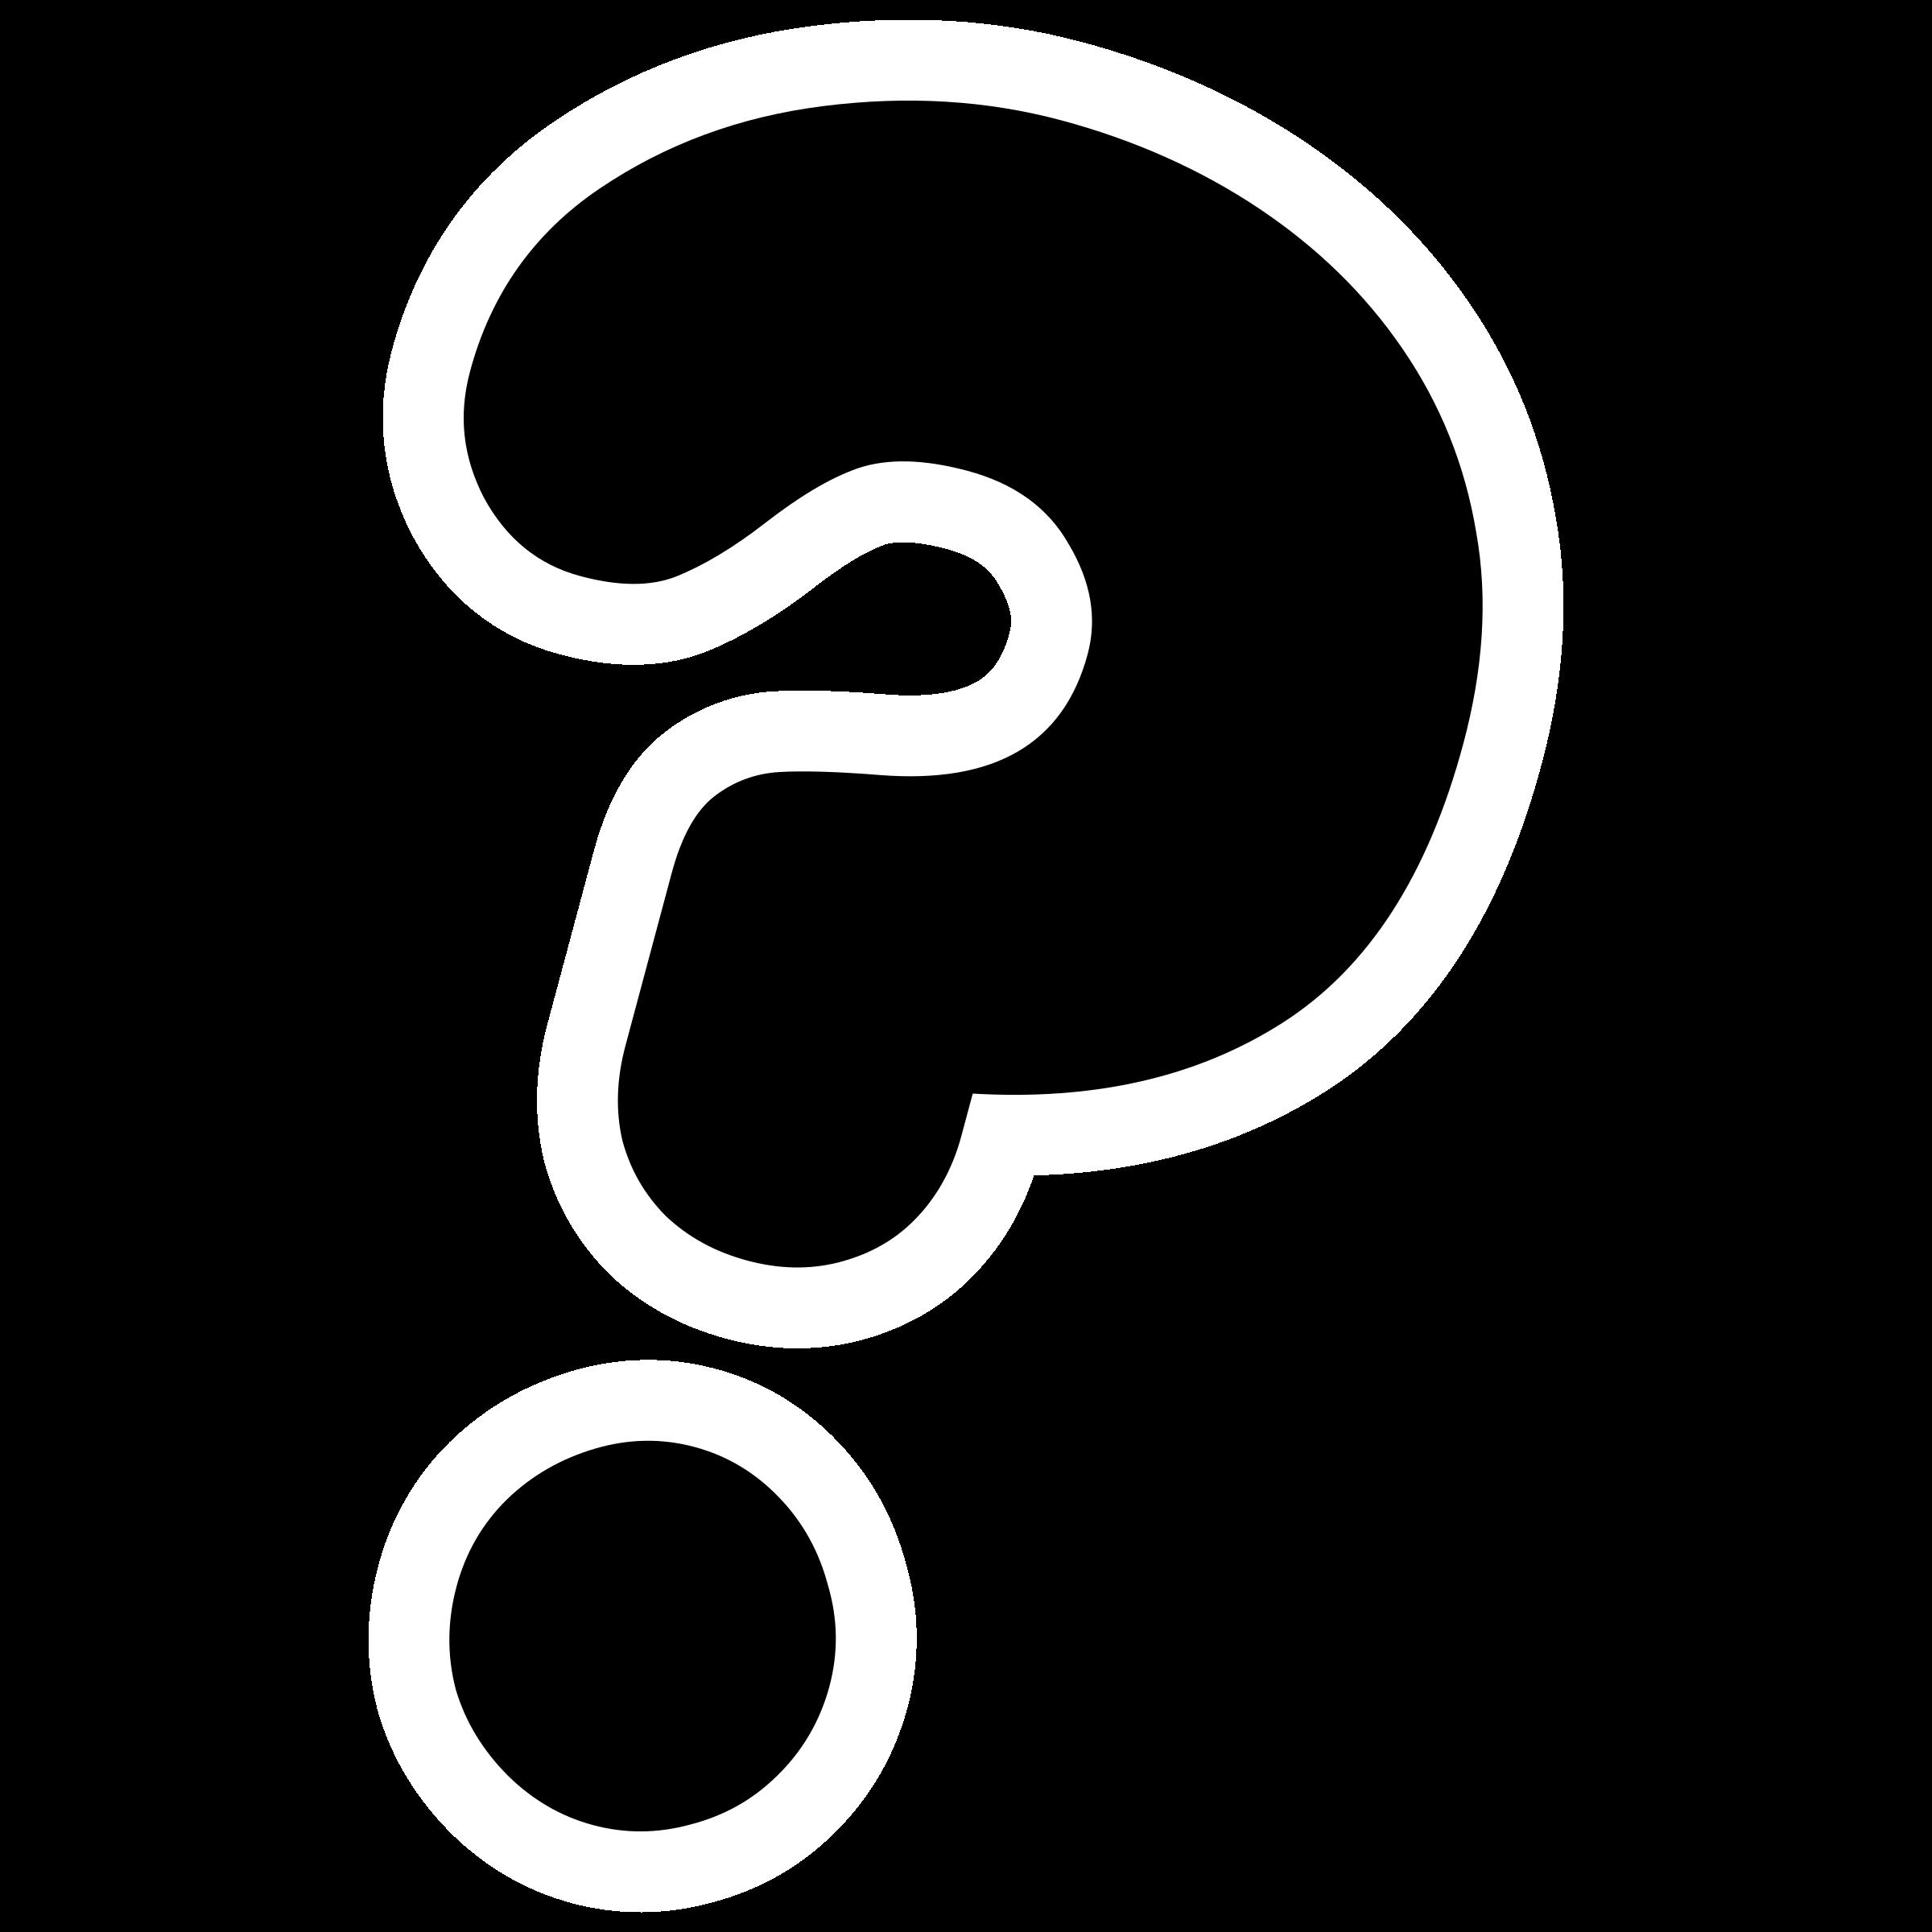 Printable question mark clipart 2 .